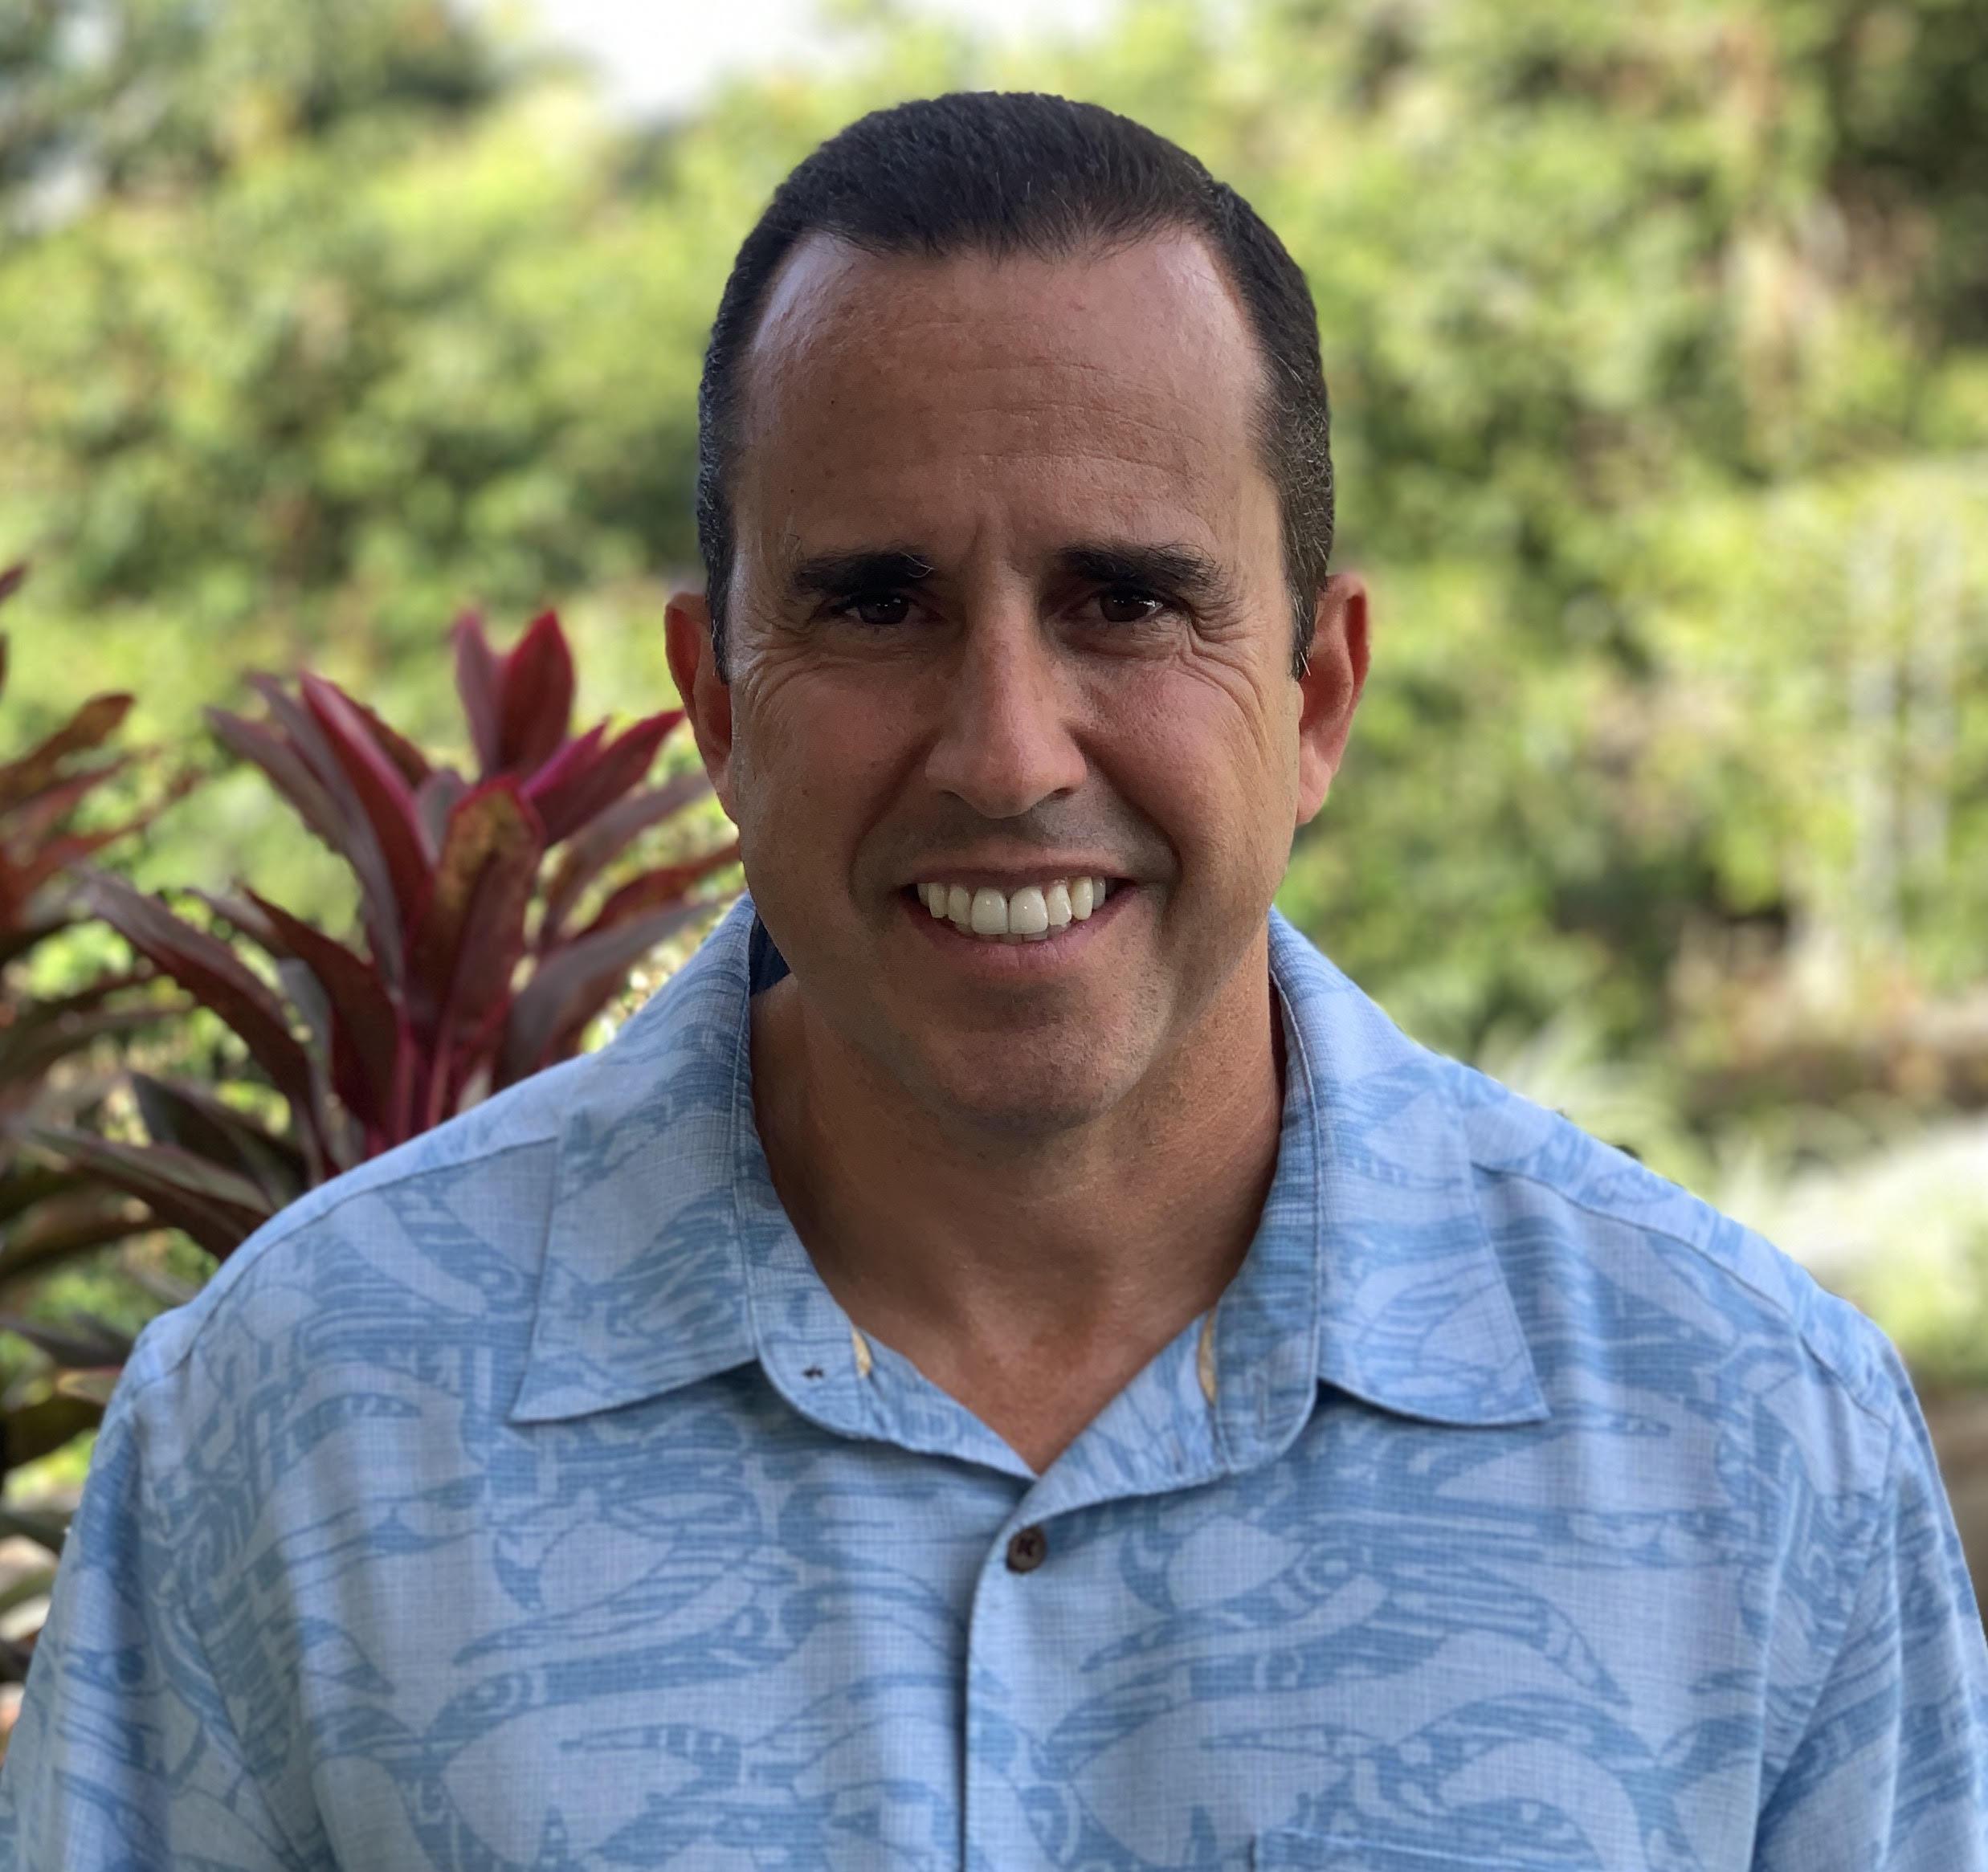 Contact Dan Polimino Hawaii Team Luxury Real Estate